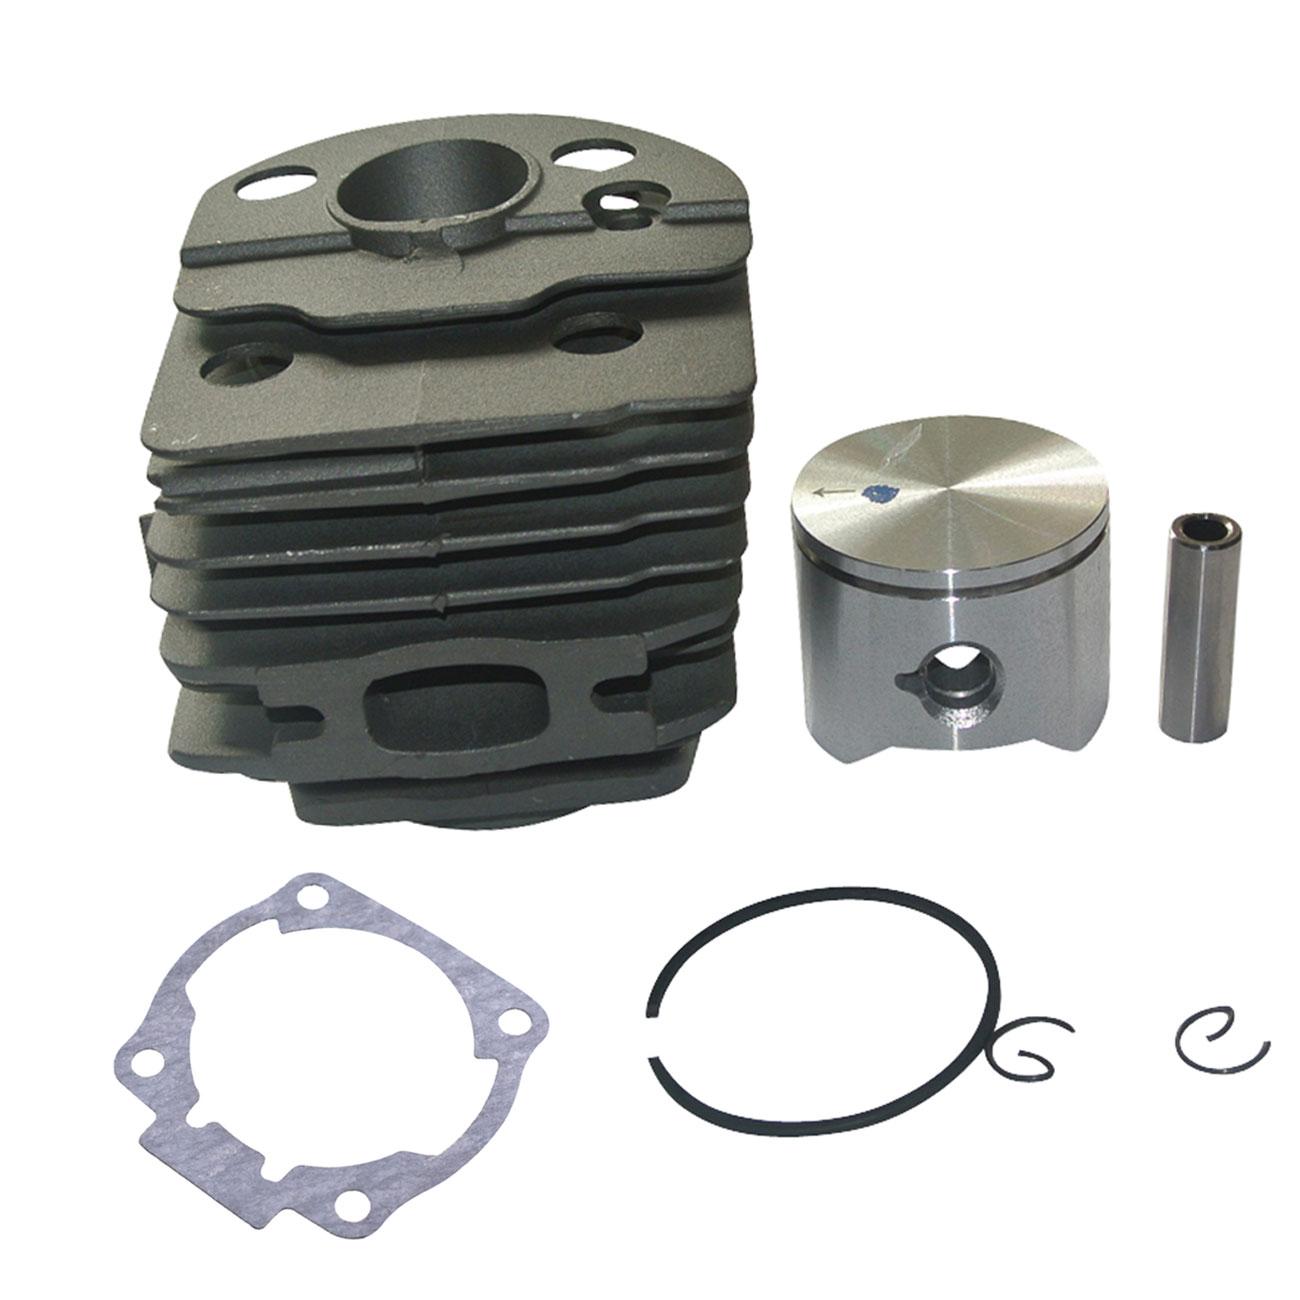 45mm Engine Motor Cylinder Piston Rings Kit For Husqvarna 55 51 50 Chainsaw